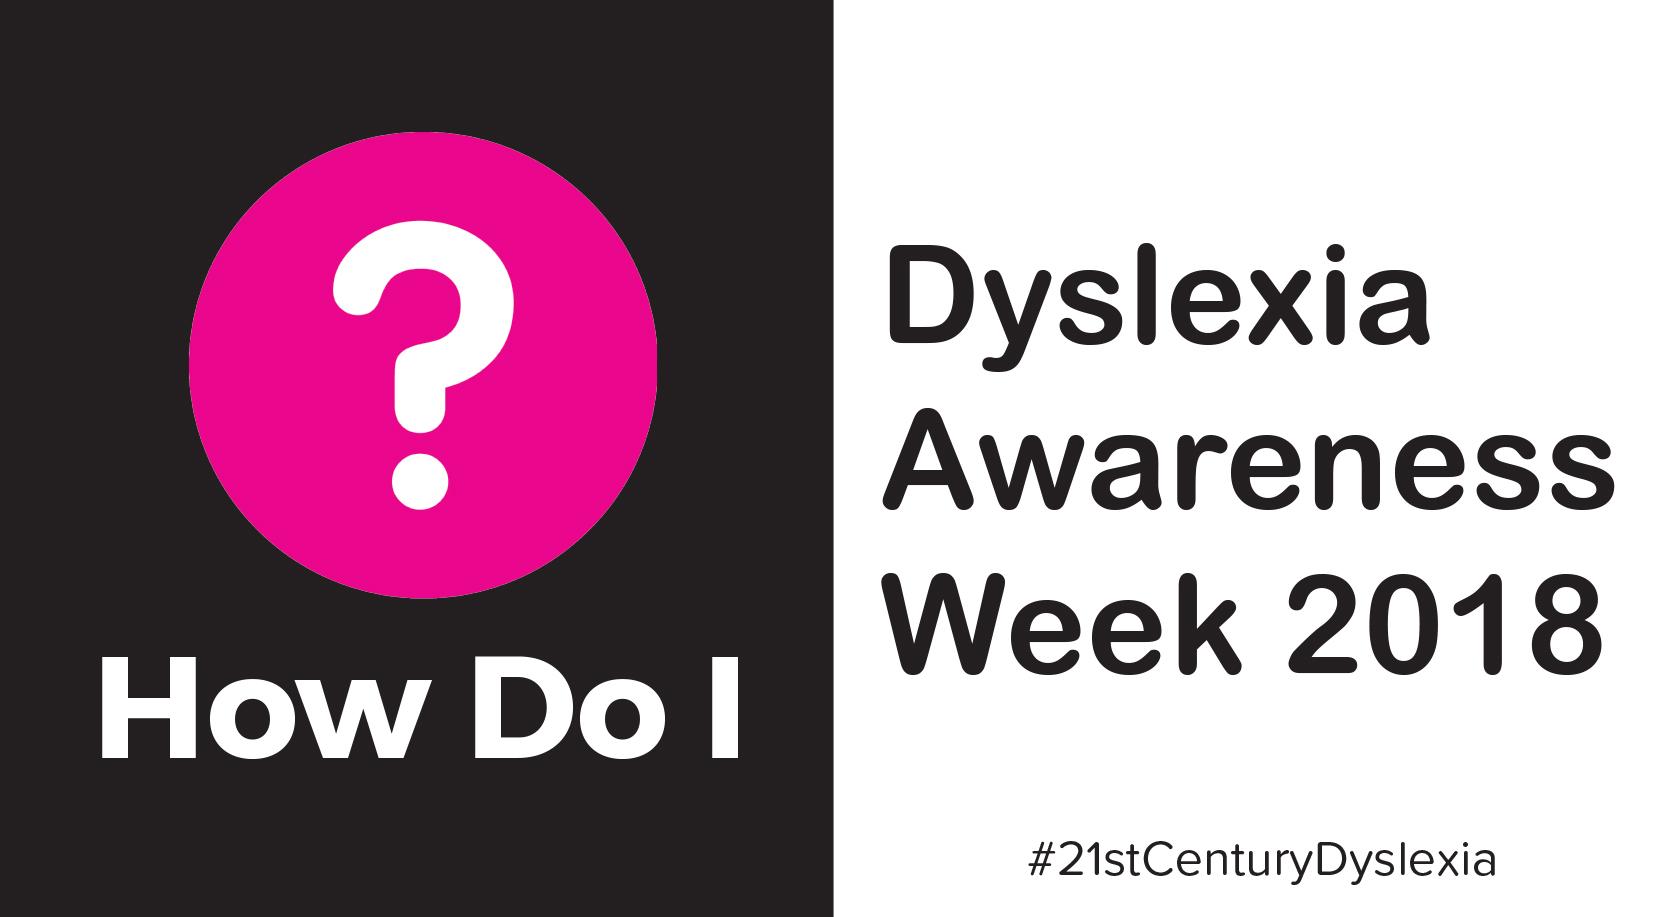 How Do I - Dyslexia Awareness Week 2018